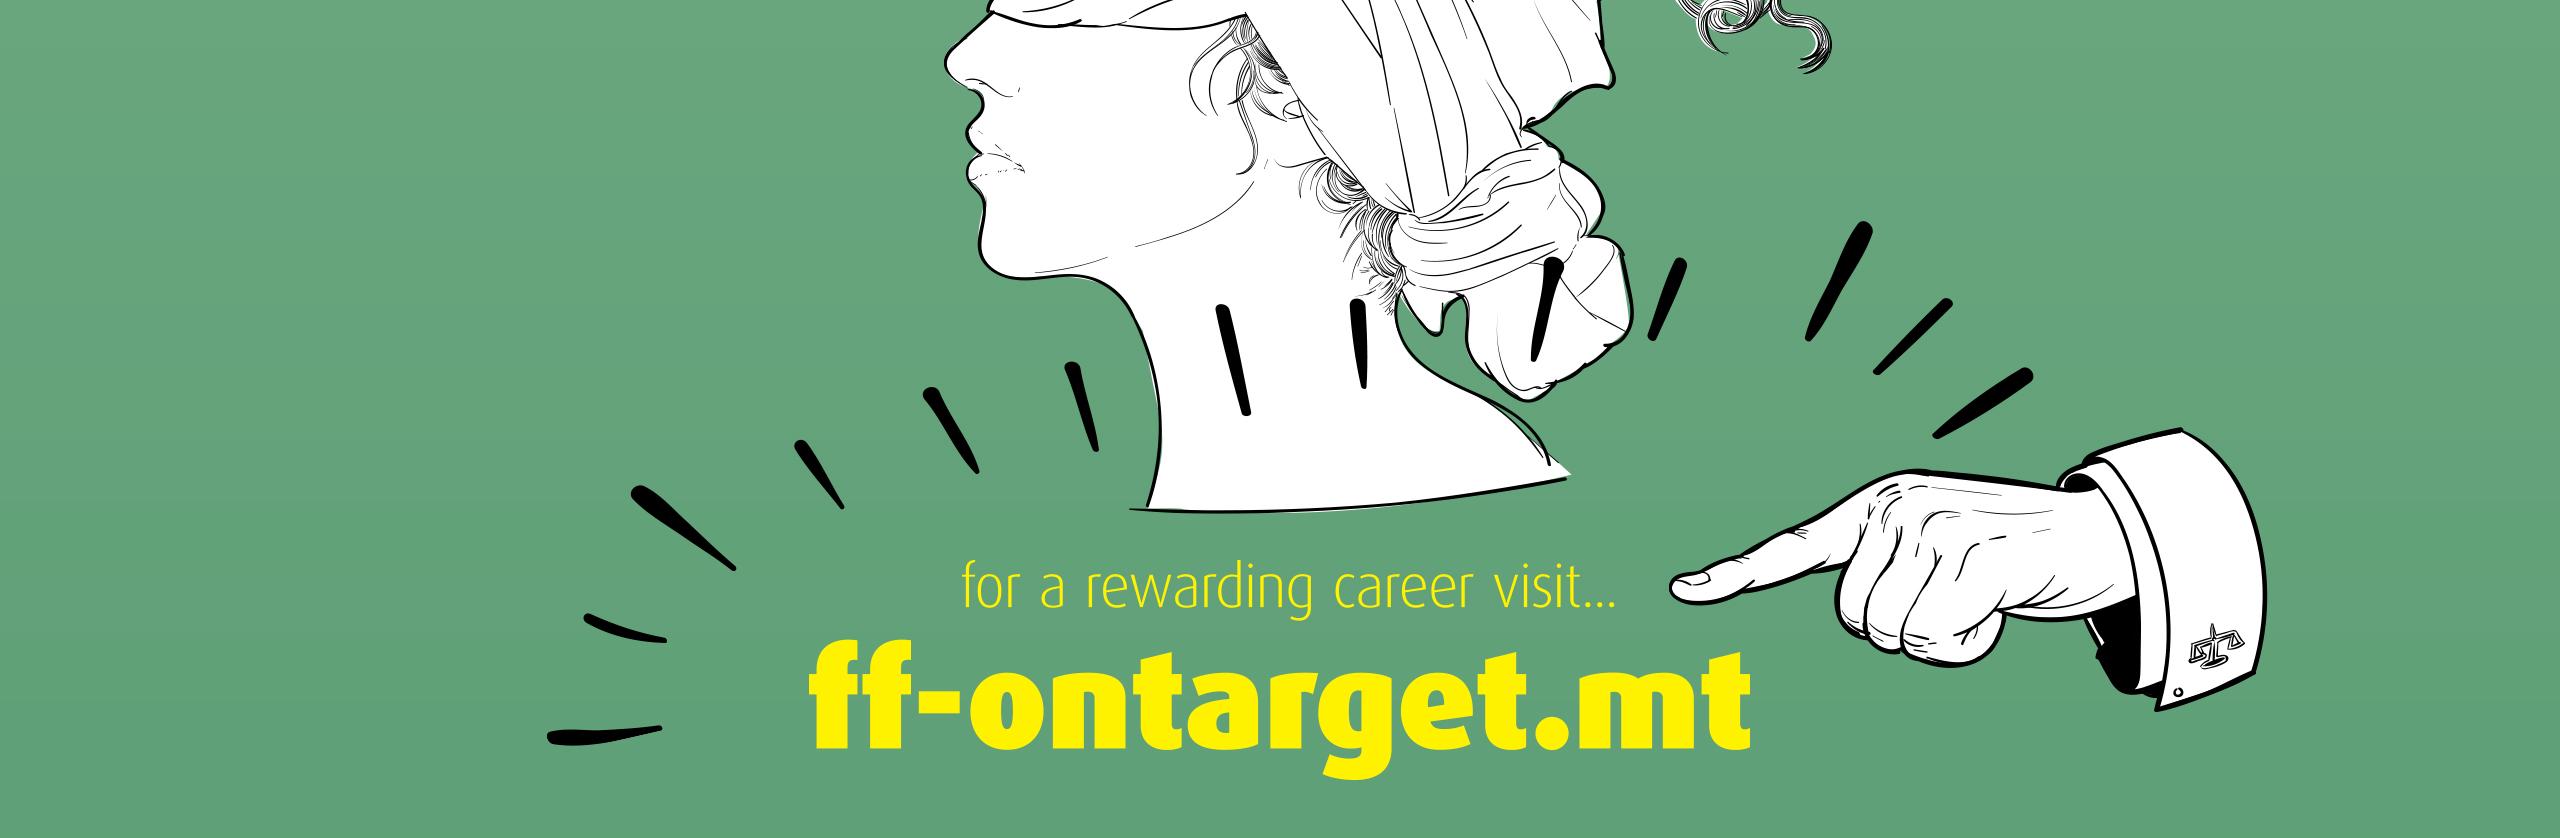 02-F&F-Portfolio-post-flat-0-03 case study